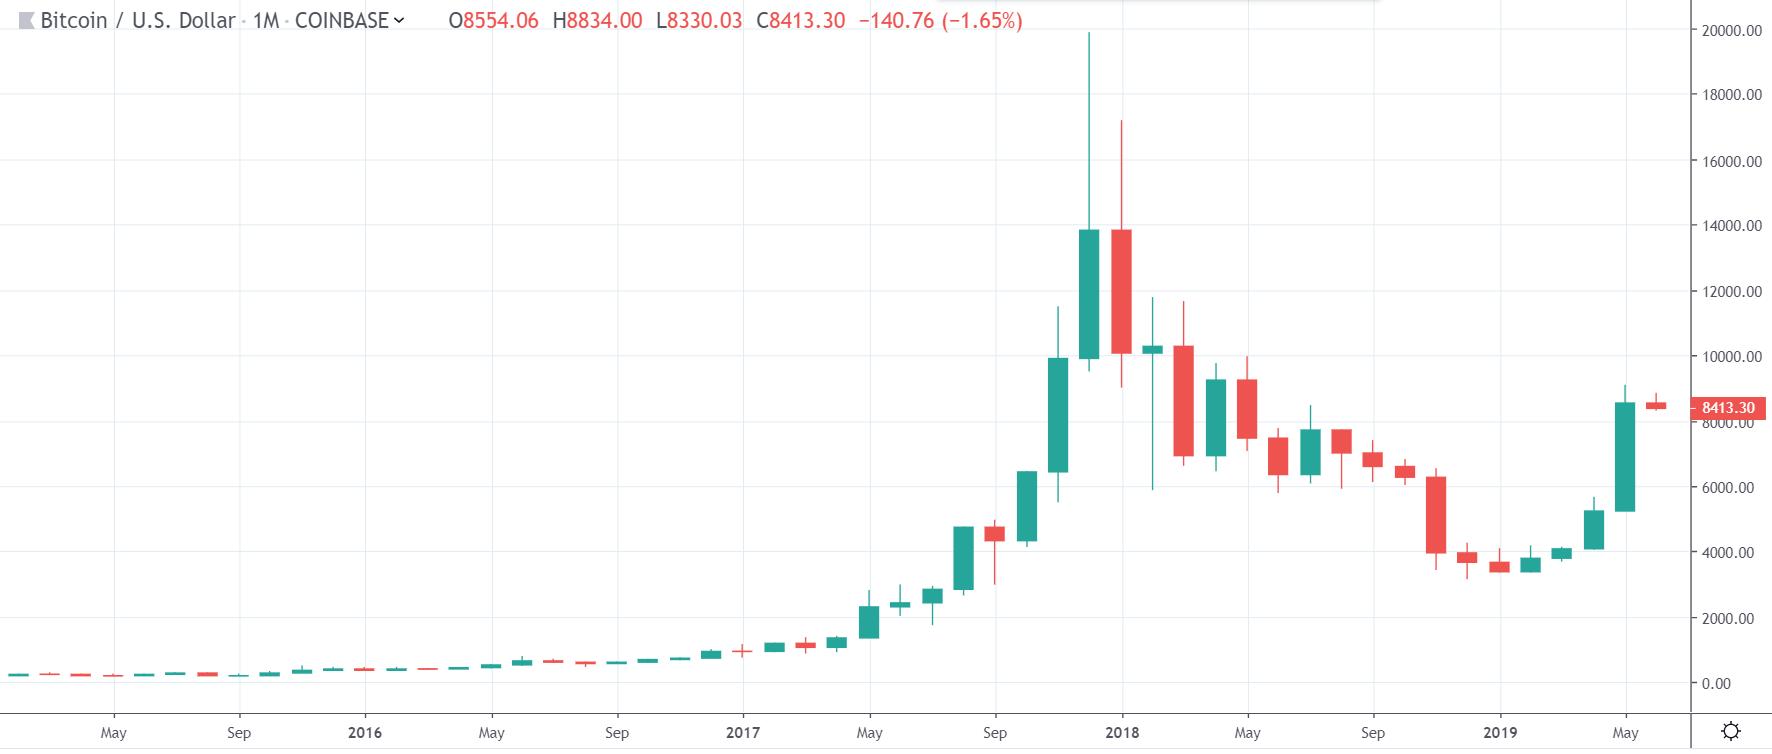 bitcoin, market, cryptocurrency, trading, crypto, blockchain, ethereum, may